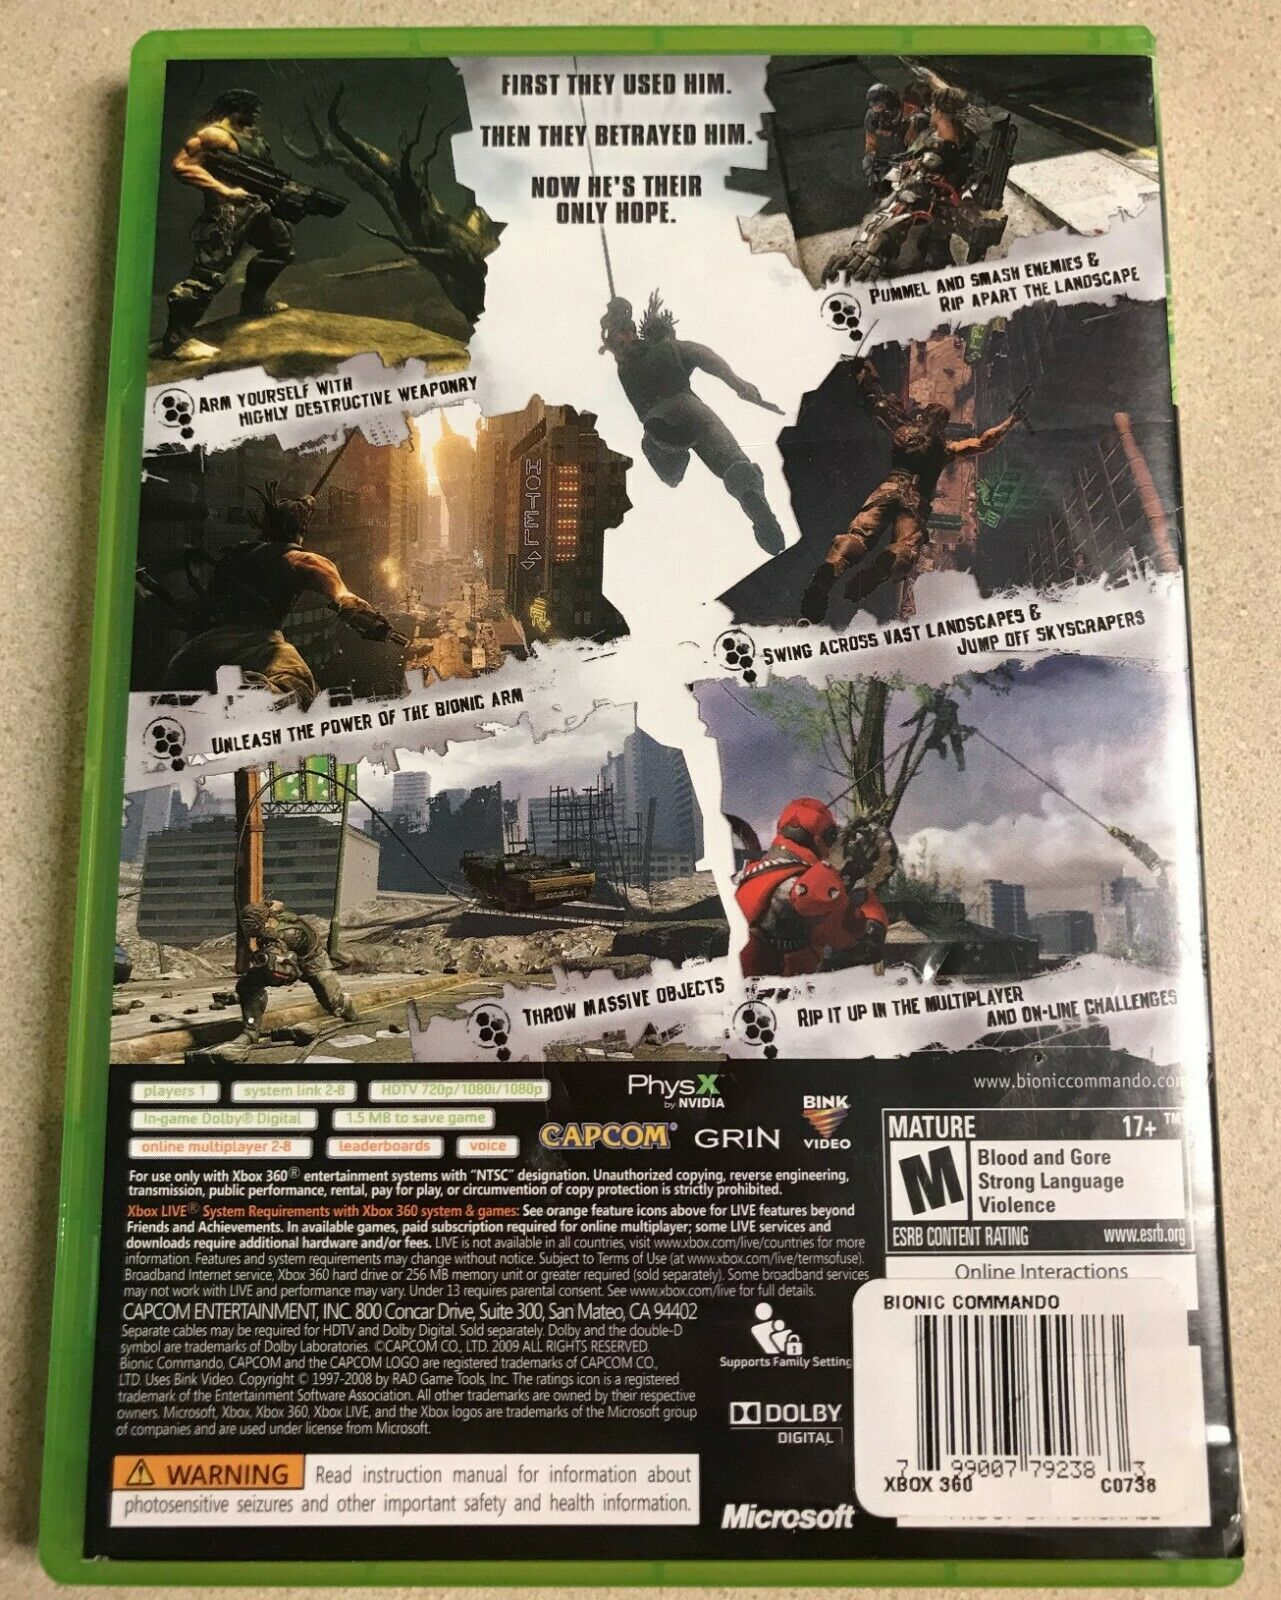 Bionic Commando (Microsoft Xbox 360, 2009) Game image 2